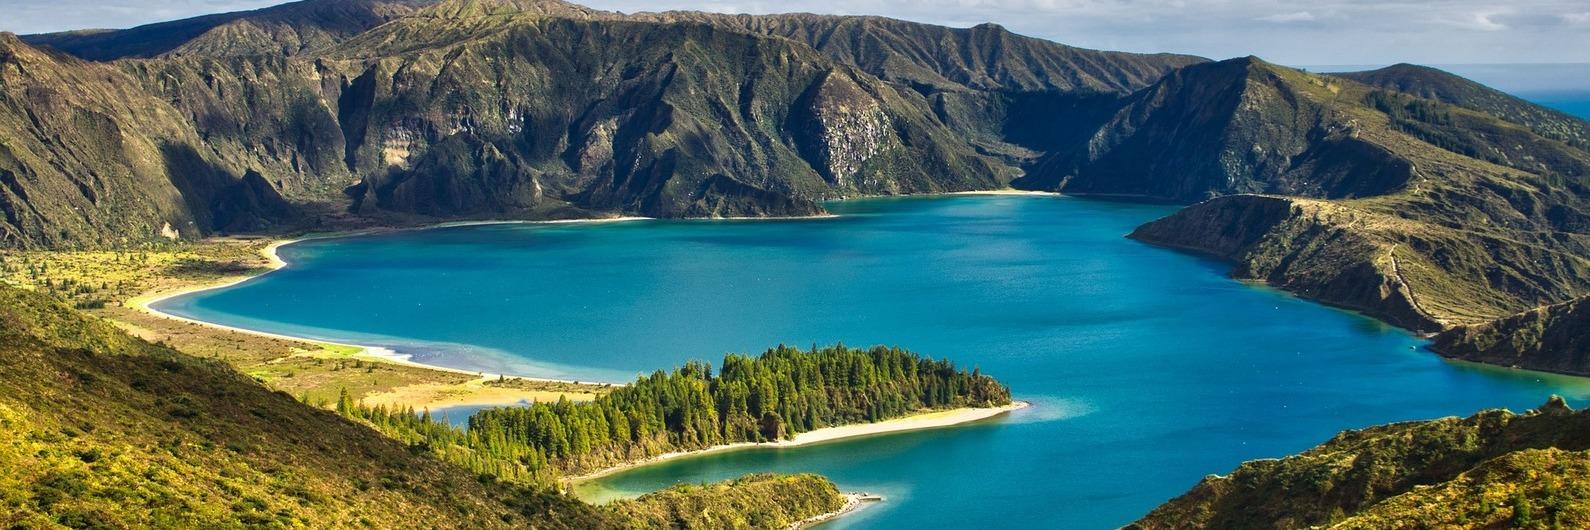 O Festival Tremor vai tomar conta da Ilha de S. Miguel